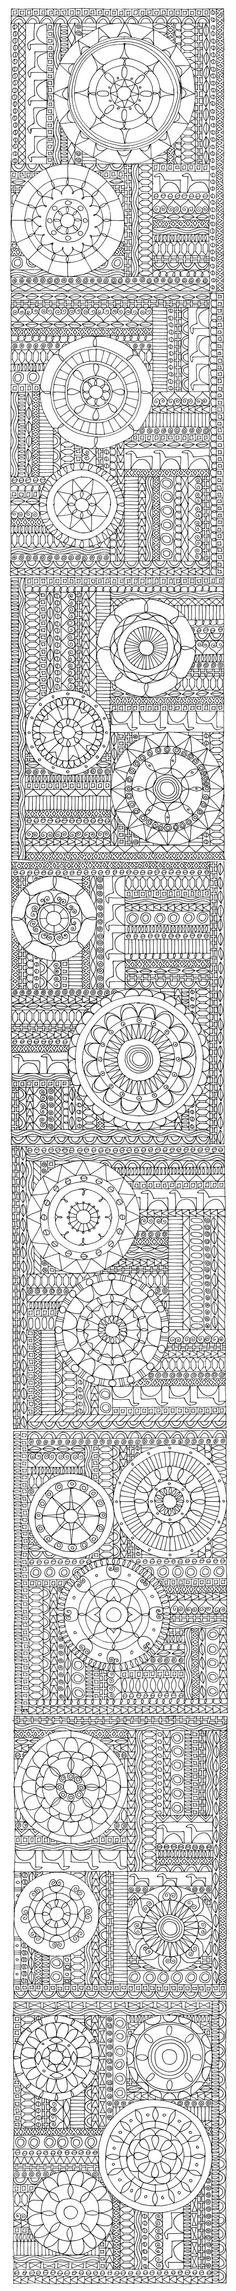 "Doodle Art Scroll from Miriam Badyrka ""The Doodler"""